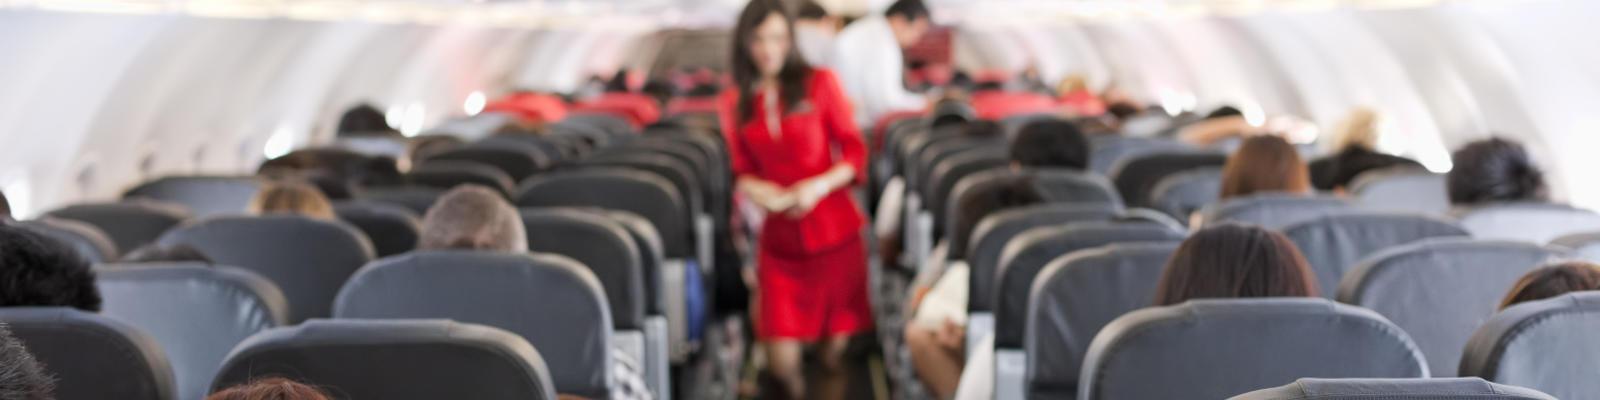 Window versus aisle seat airplane